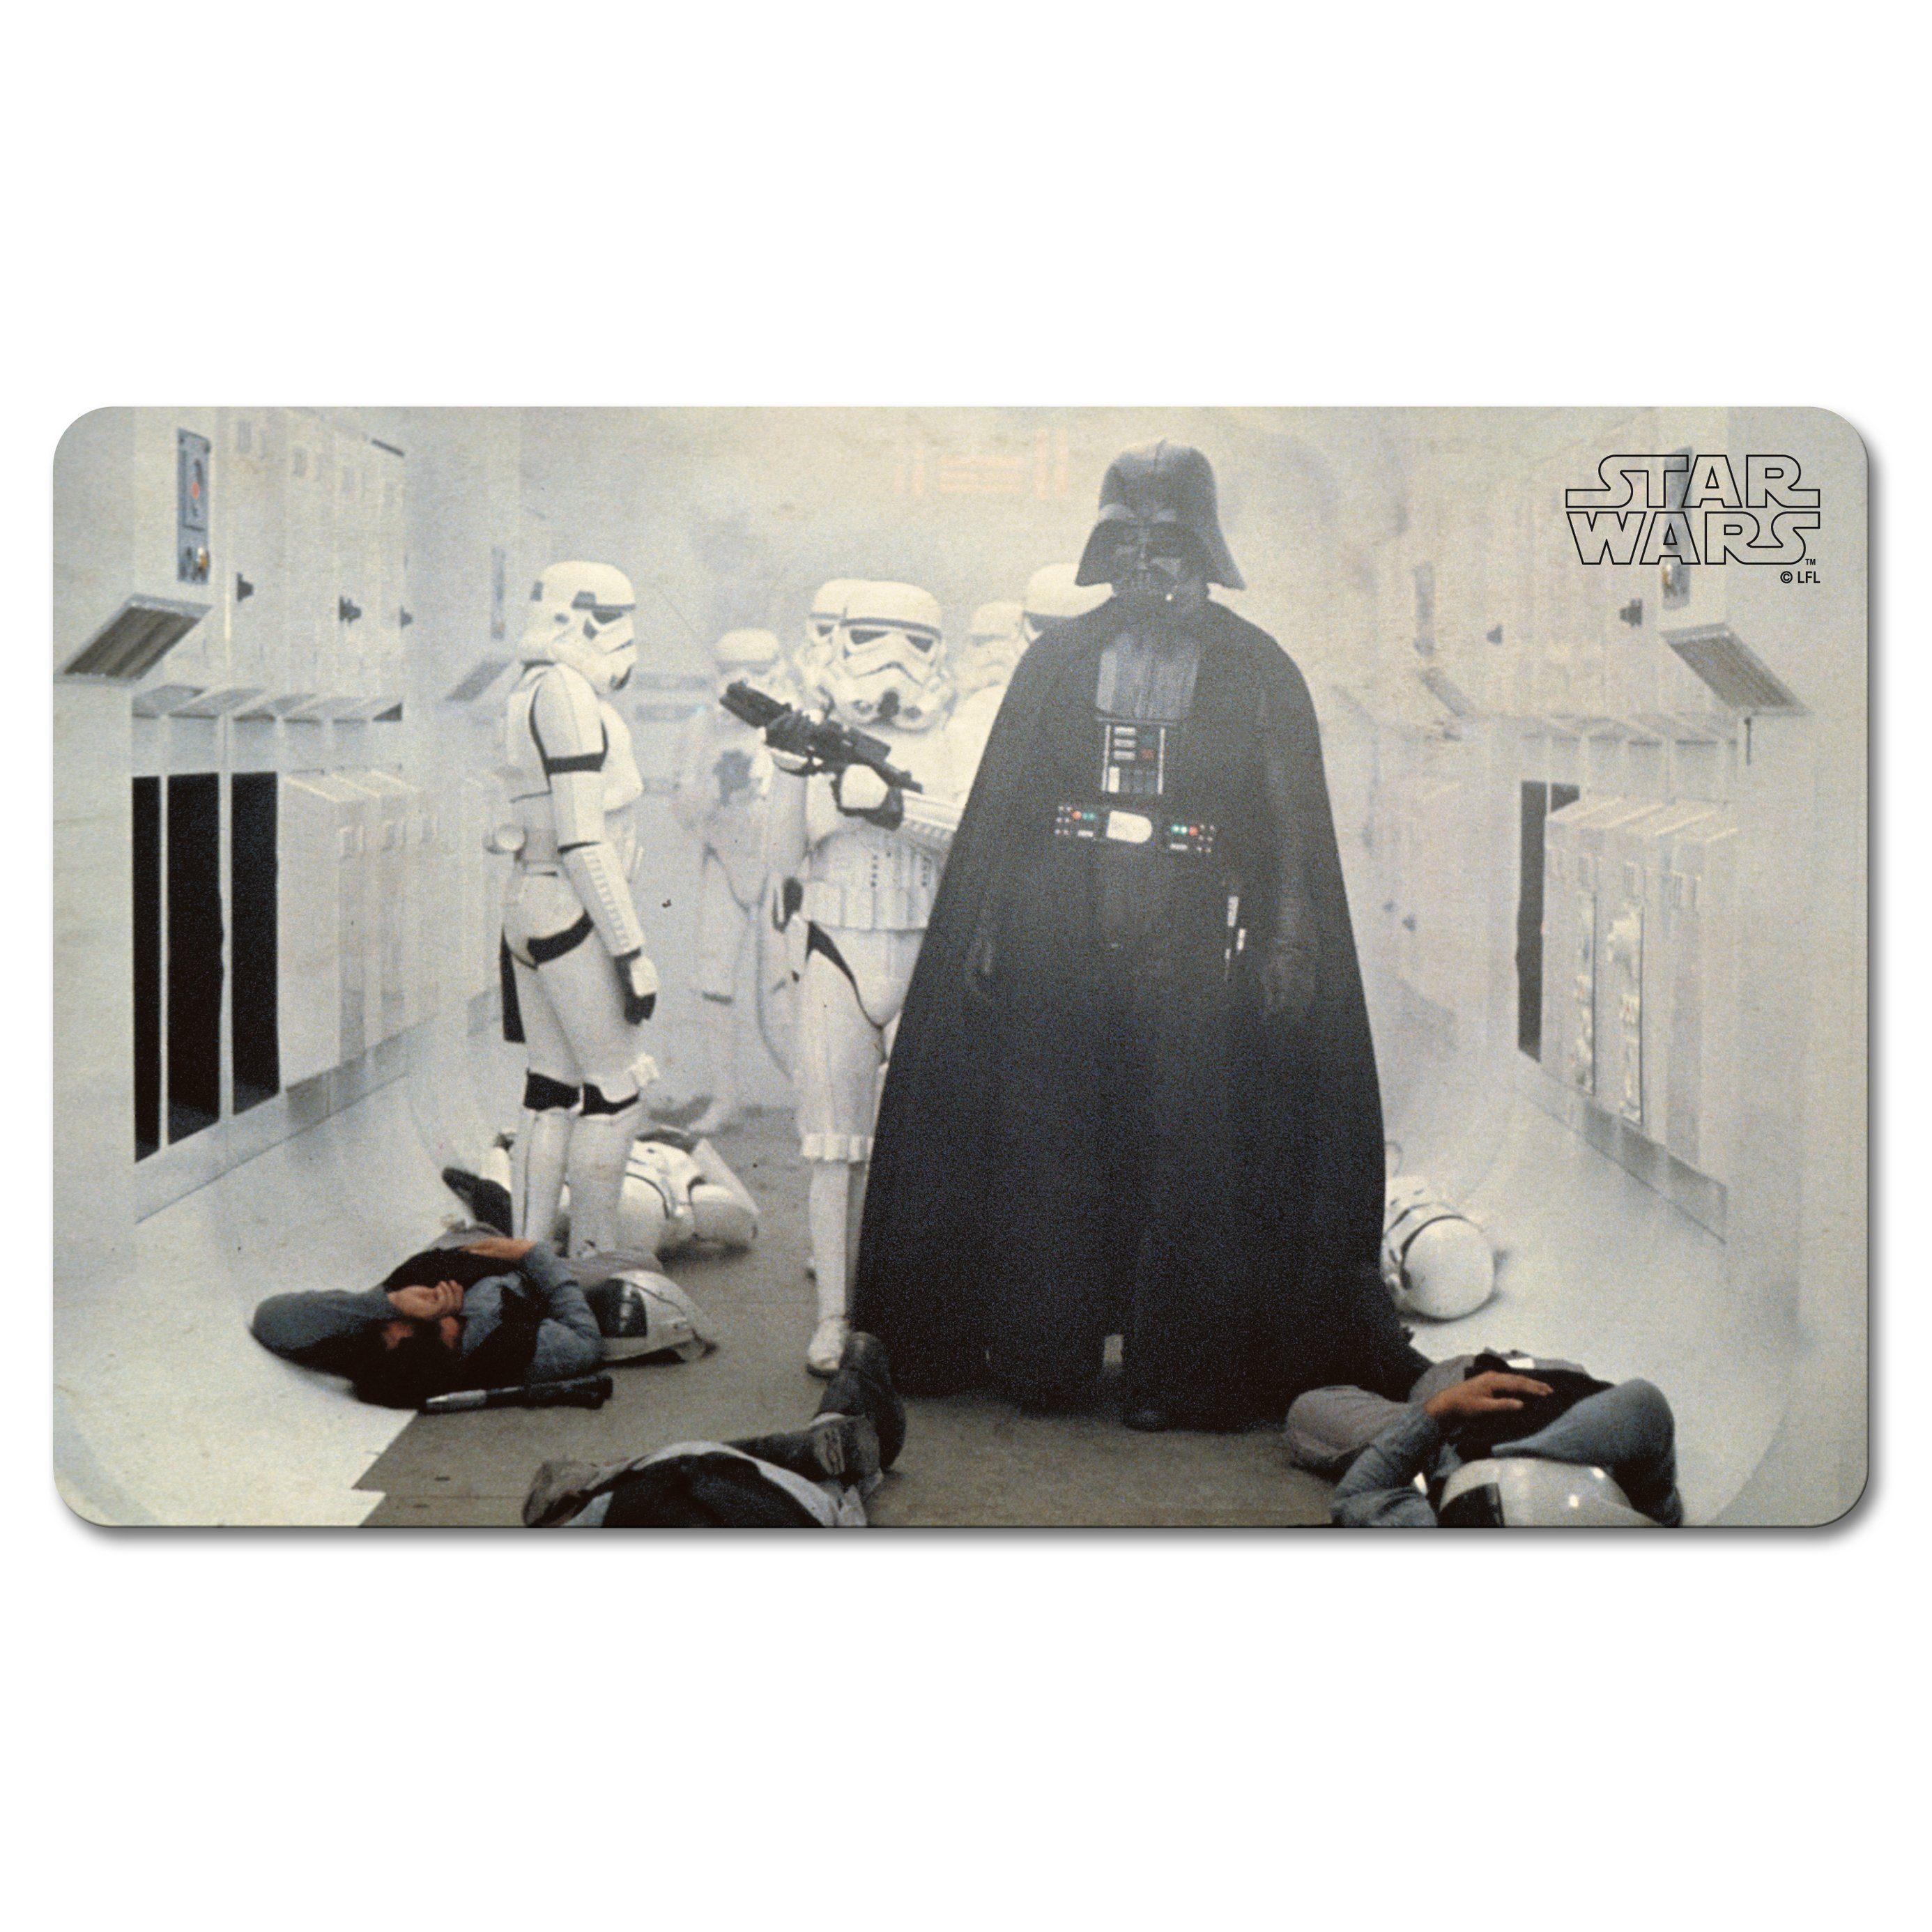 LOGOSHIRT Frühstücksbrettchen mit Darth Vader-Motiv